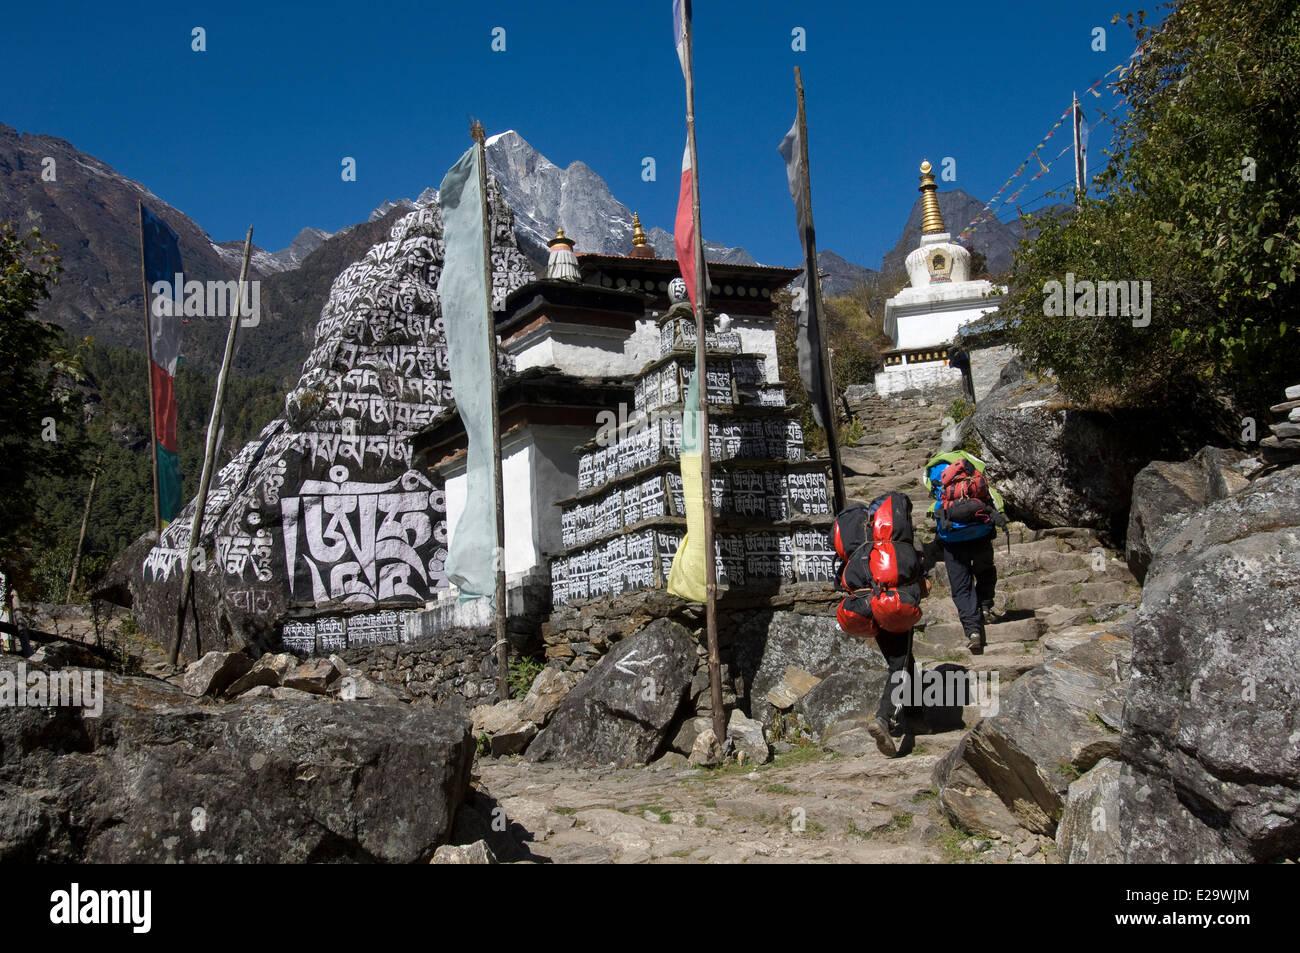 Nepal, Sagarmatha Zone, Khumbu Region, approach walk amidst stupas carved with mantras - Stock Image